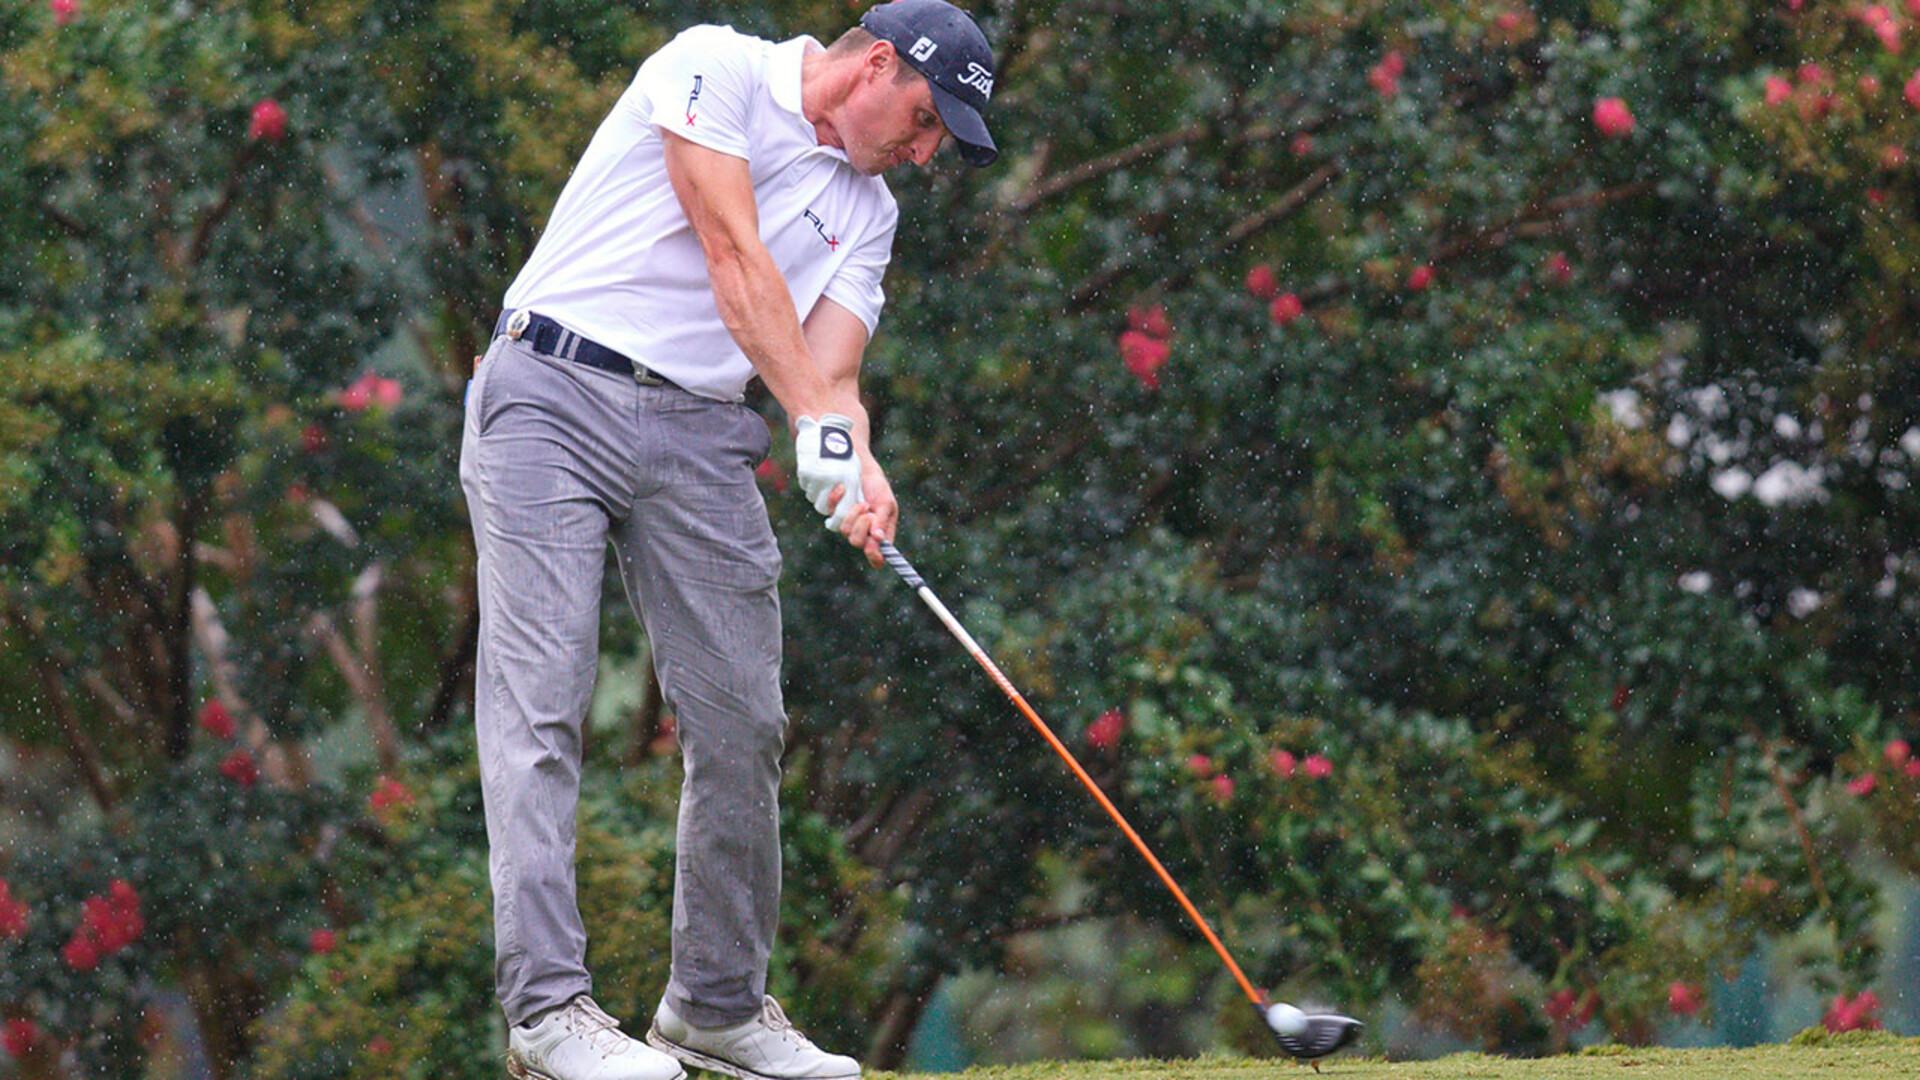 Husker alumnus plays in PGA Championship